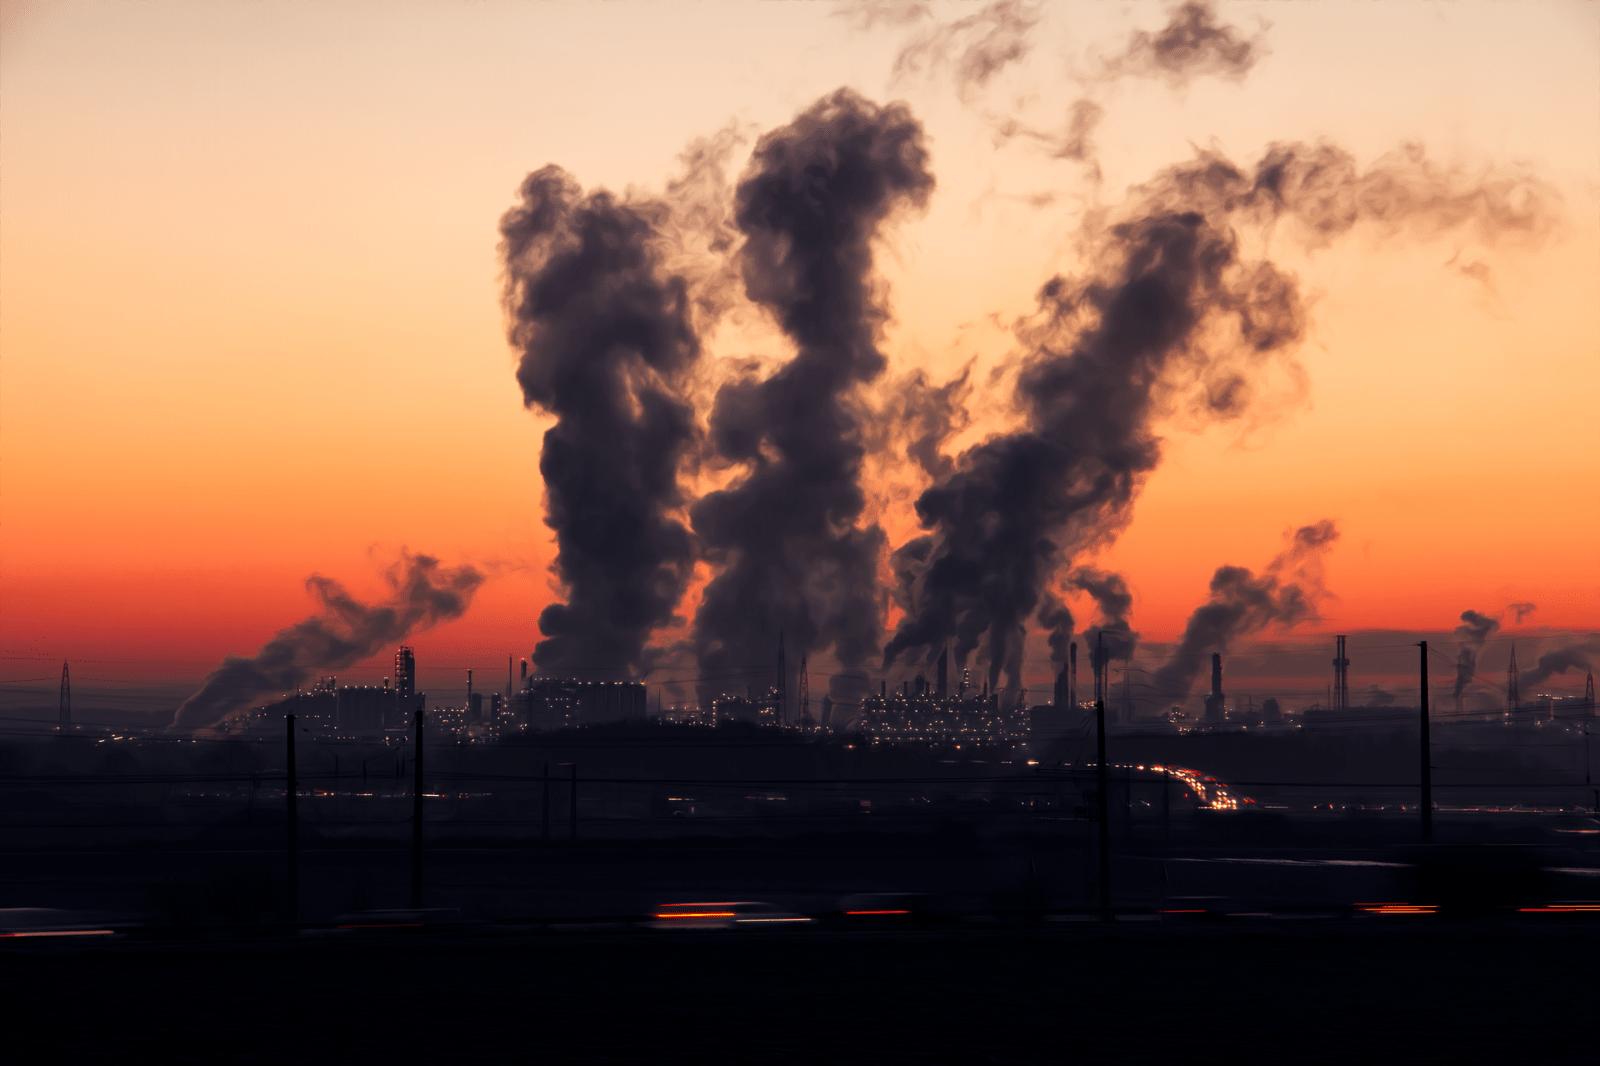 Industrie Symbolbild